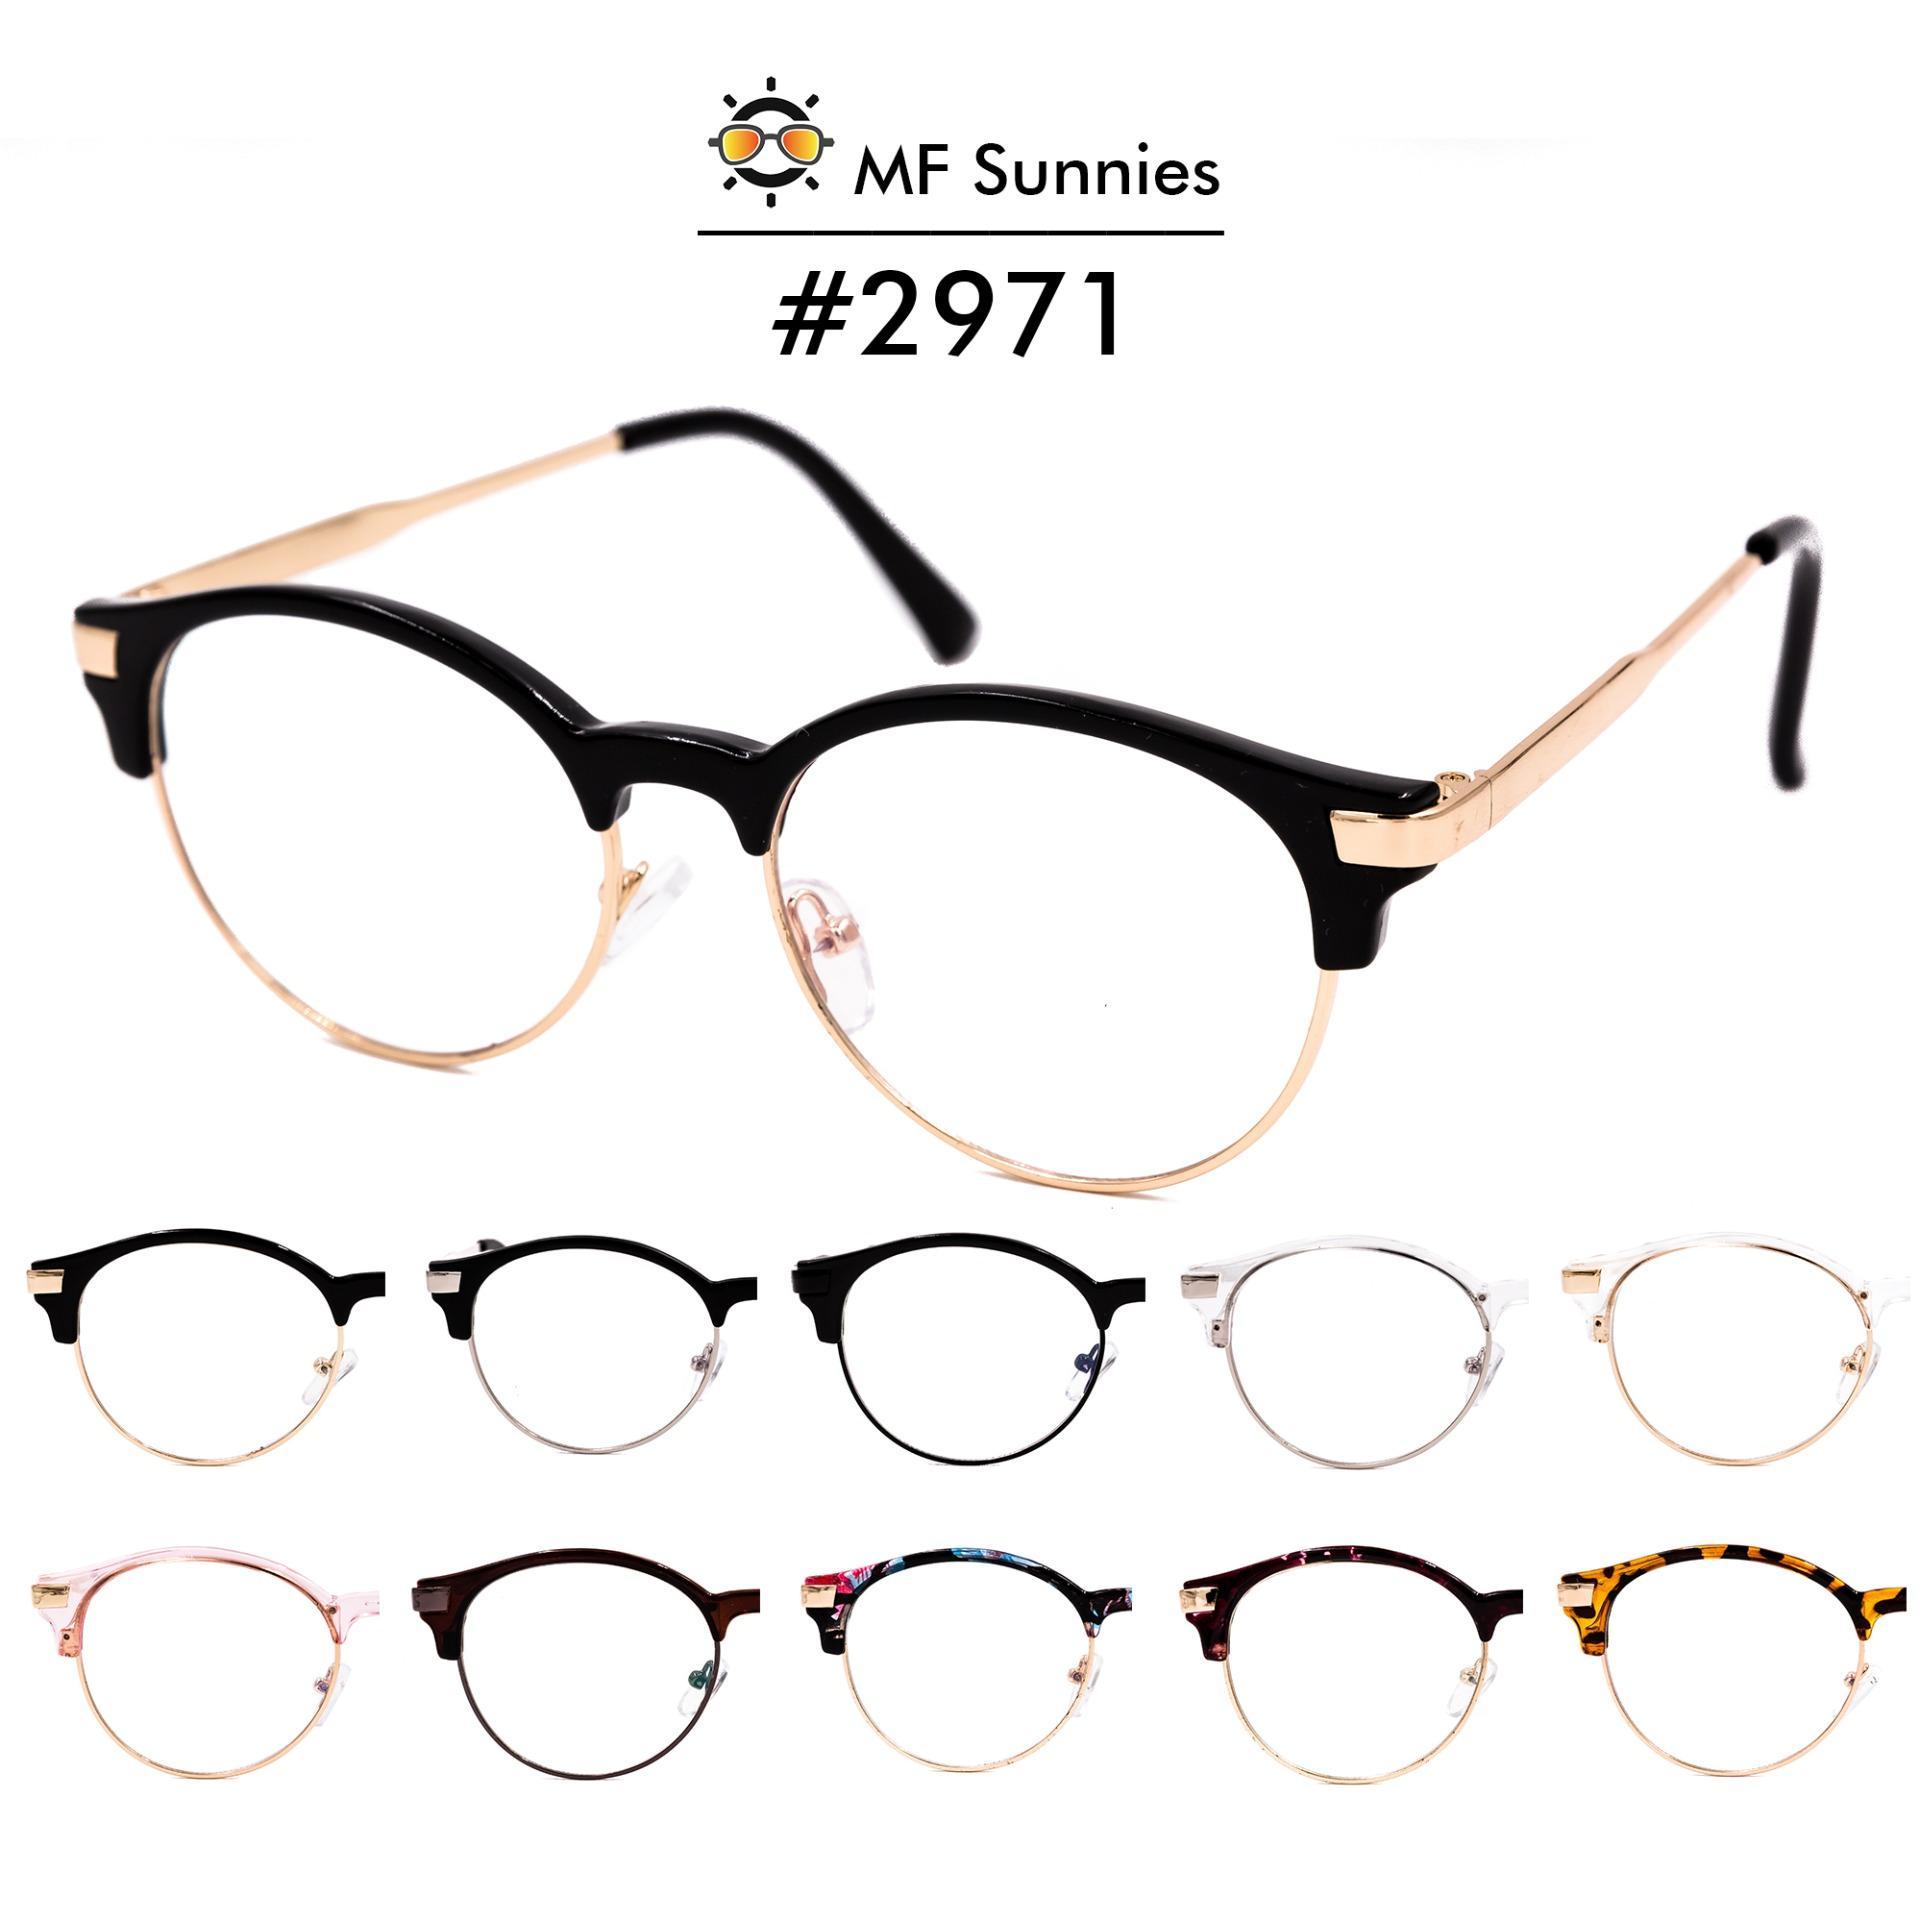 Eyeglasses for sale - Reading Glasses online brands, prices ...